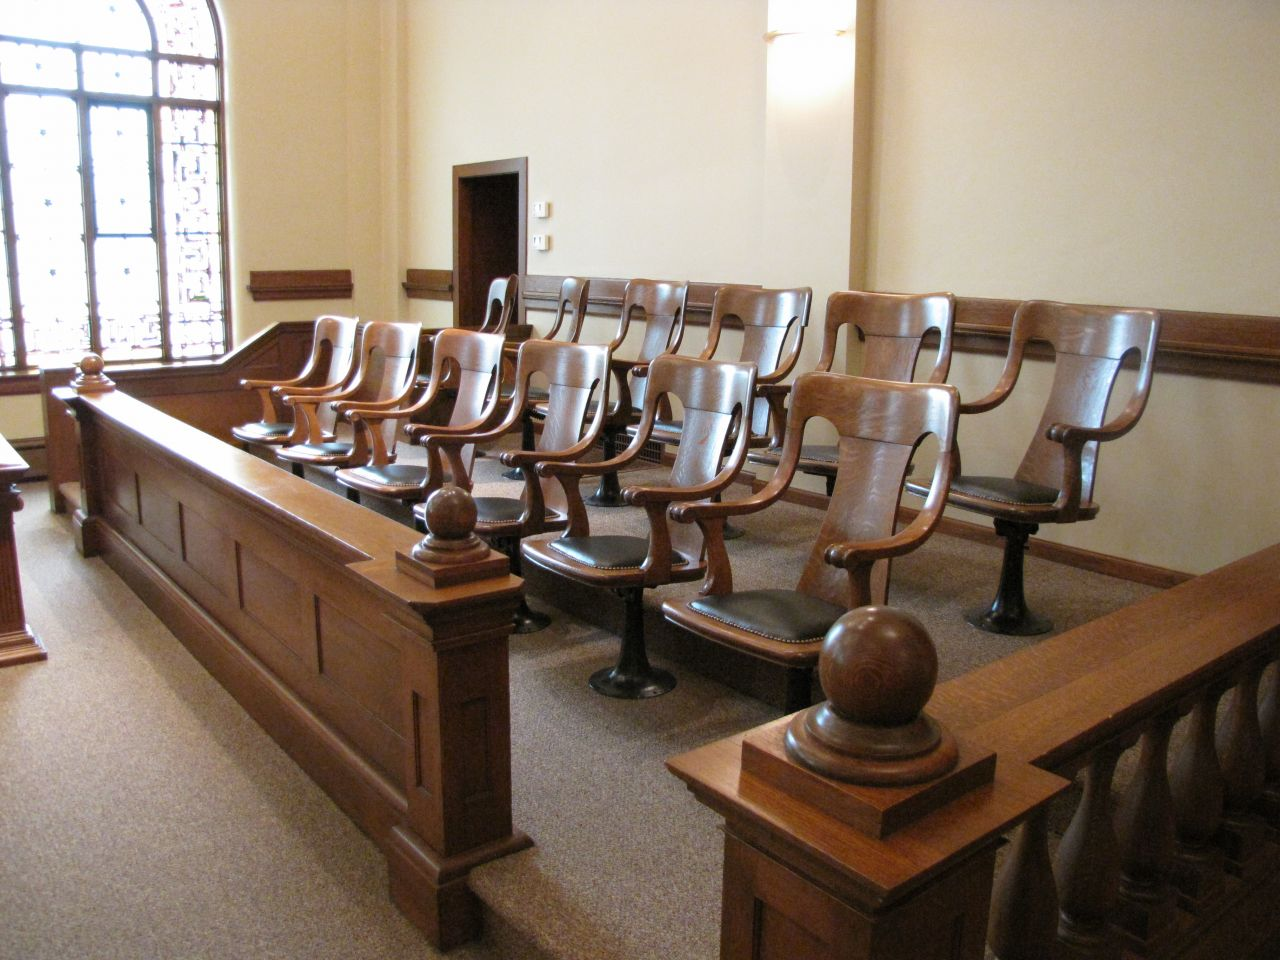 Historic Courtroom jury box